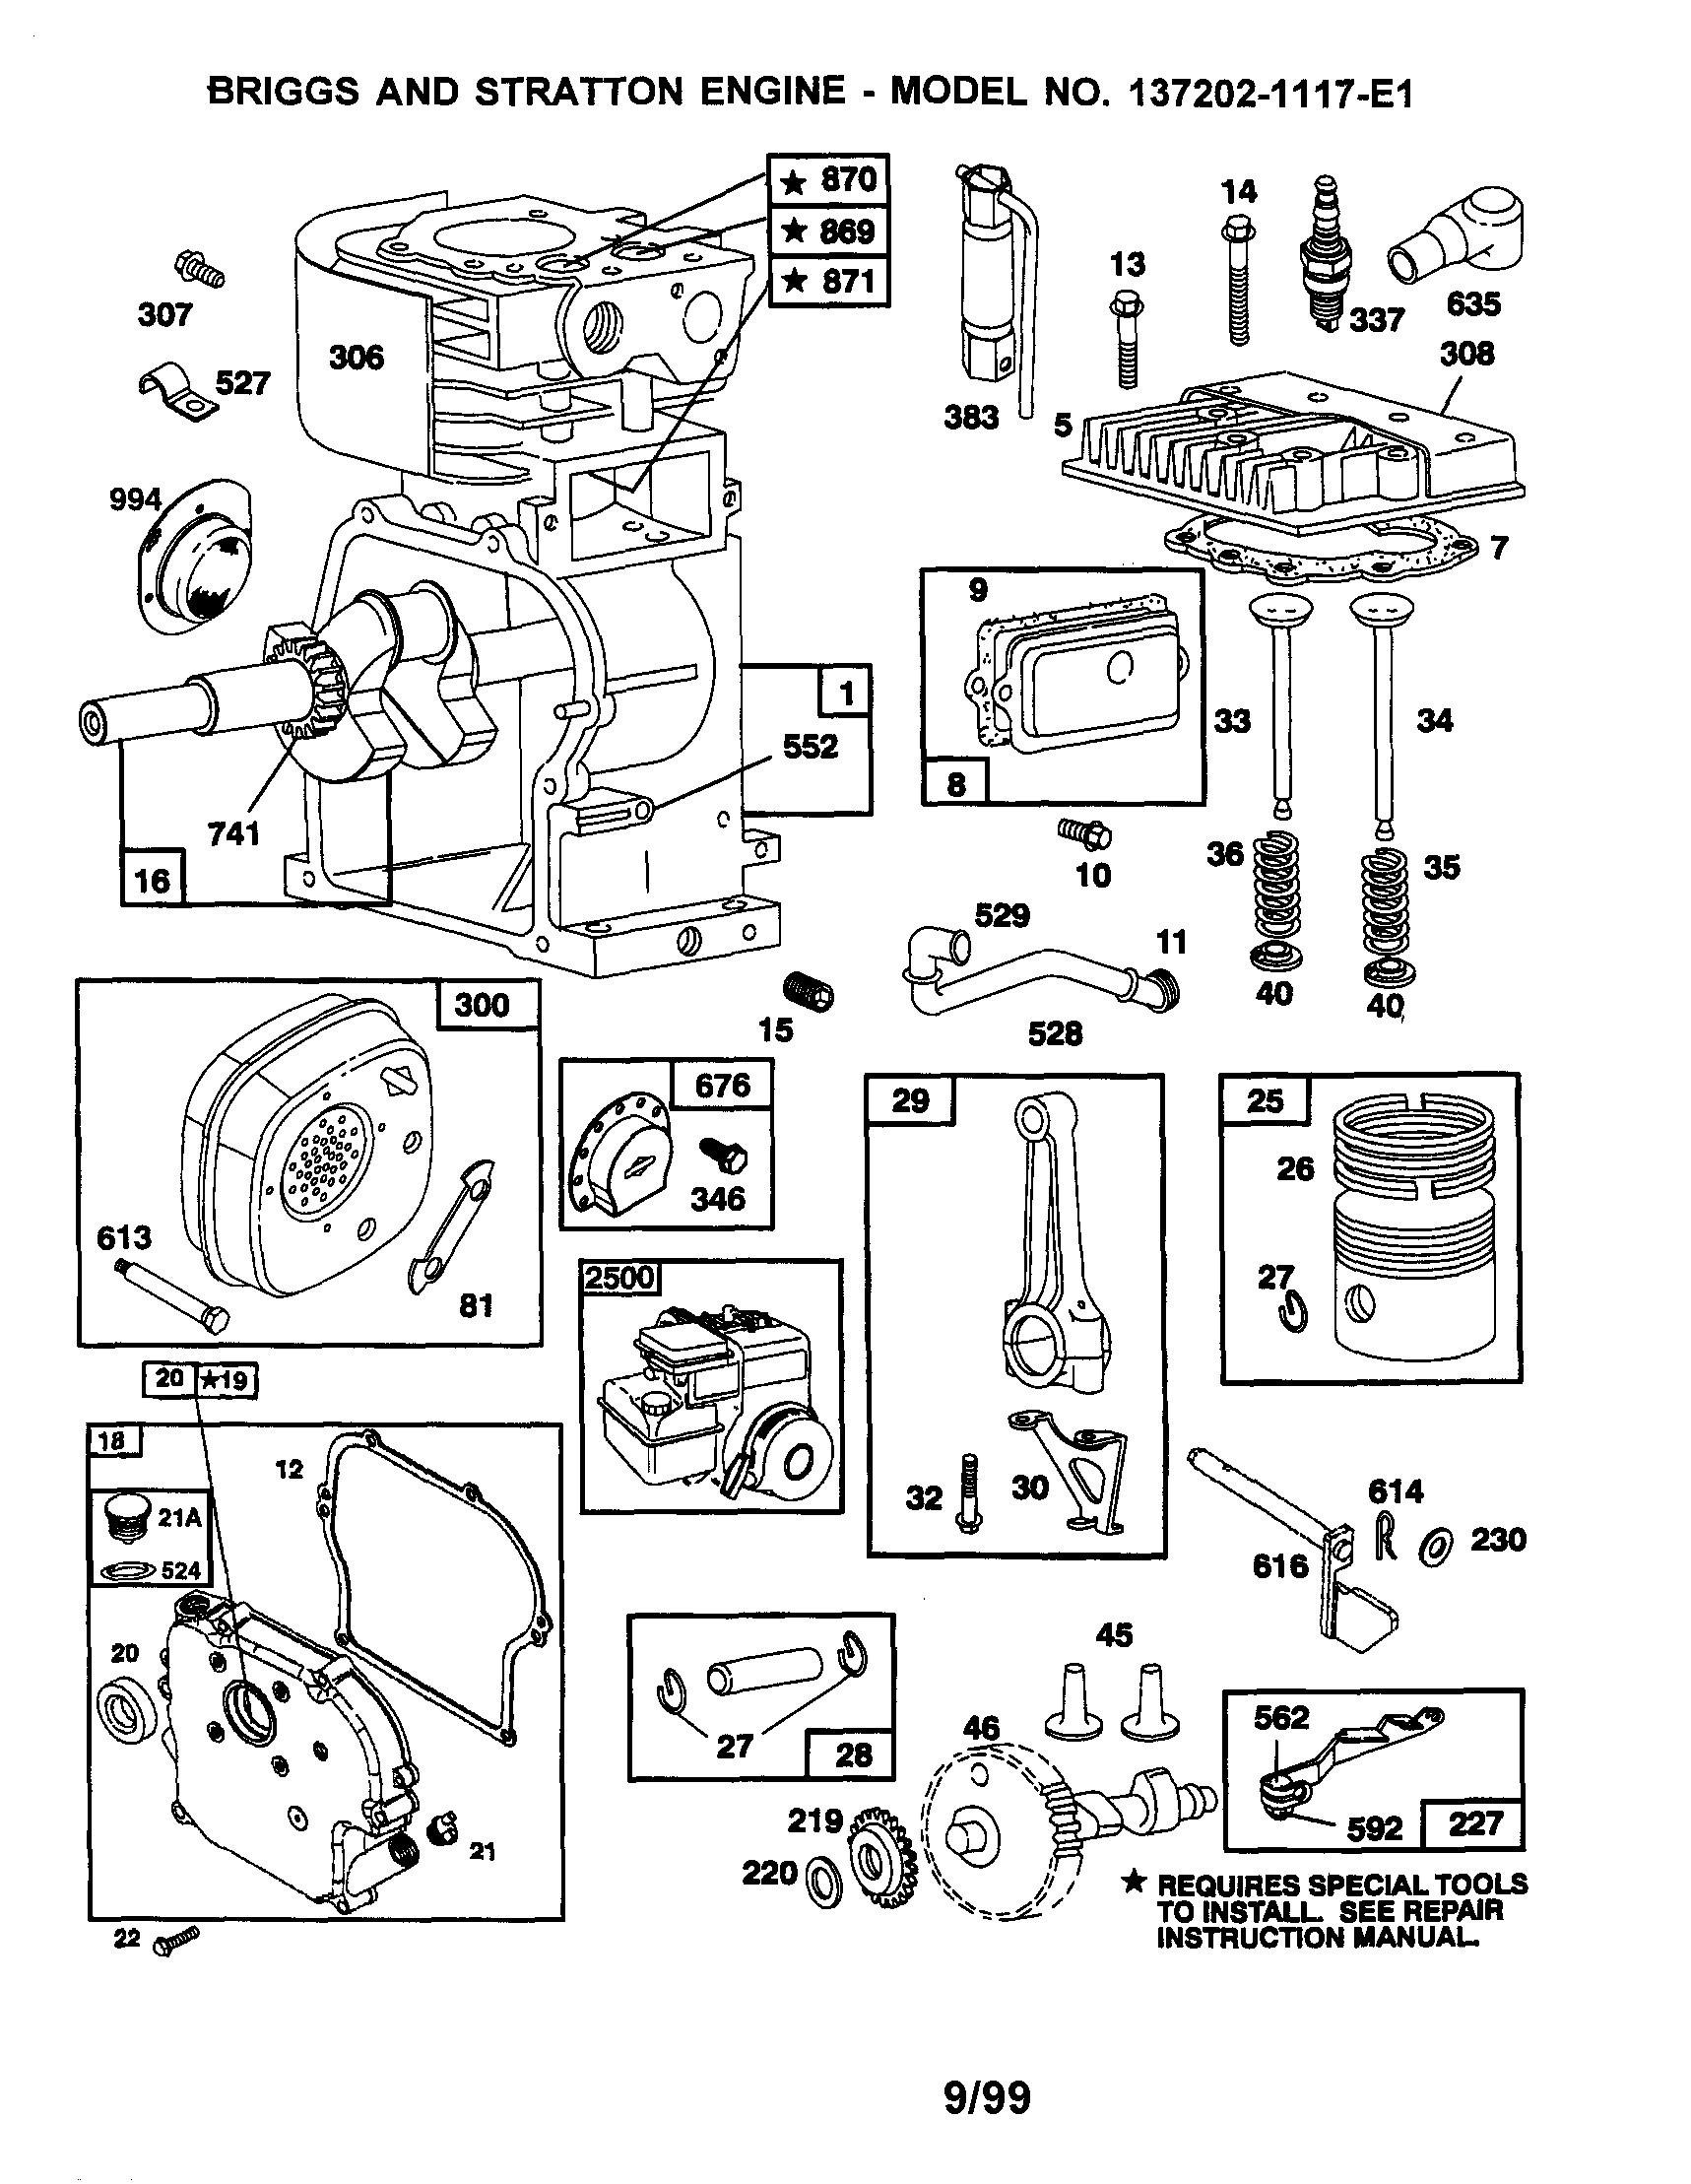 Briggs And Stratton 17 5 Hp Engine Parts Diagram 2